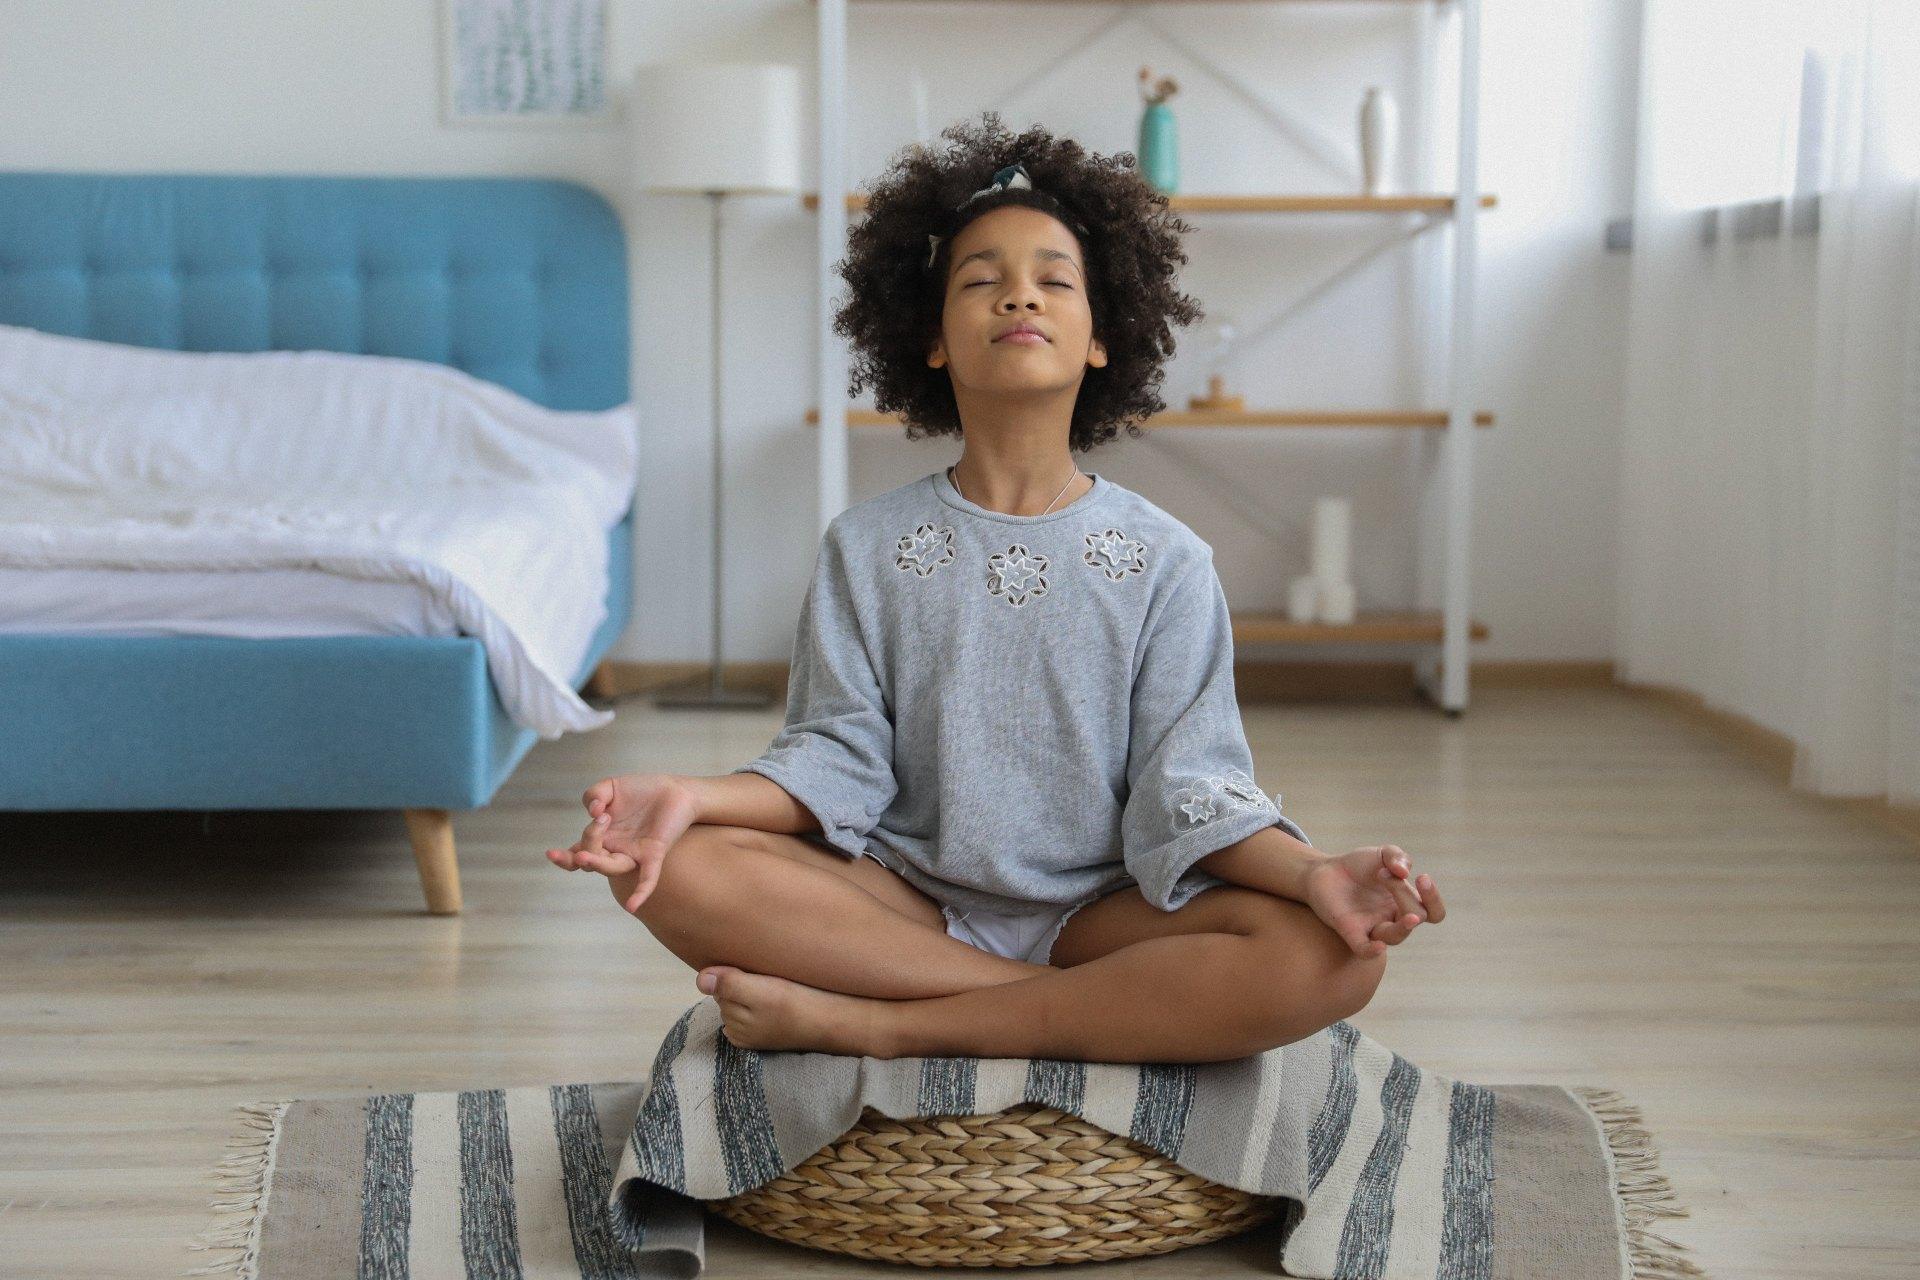 ¿Qué es el mindfulness? Educaswitch